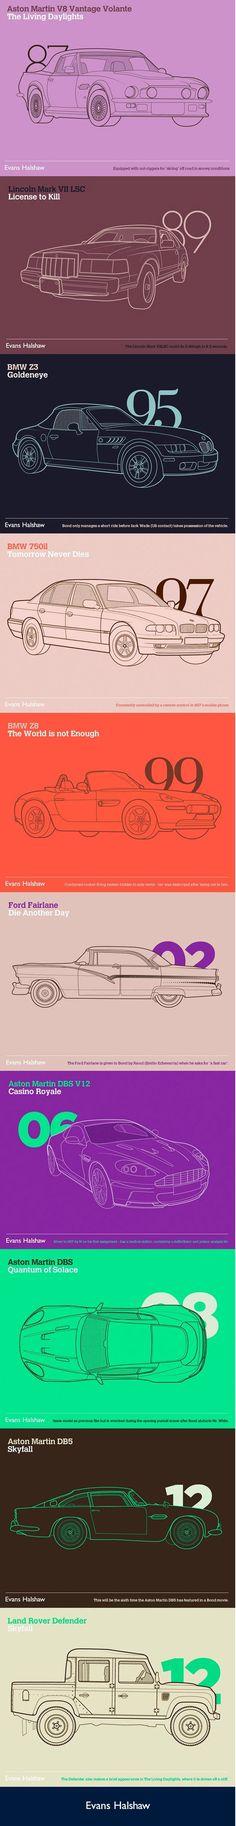 007 cars